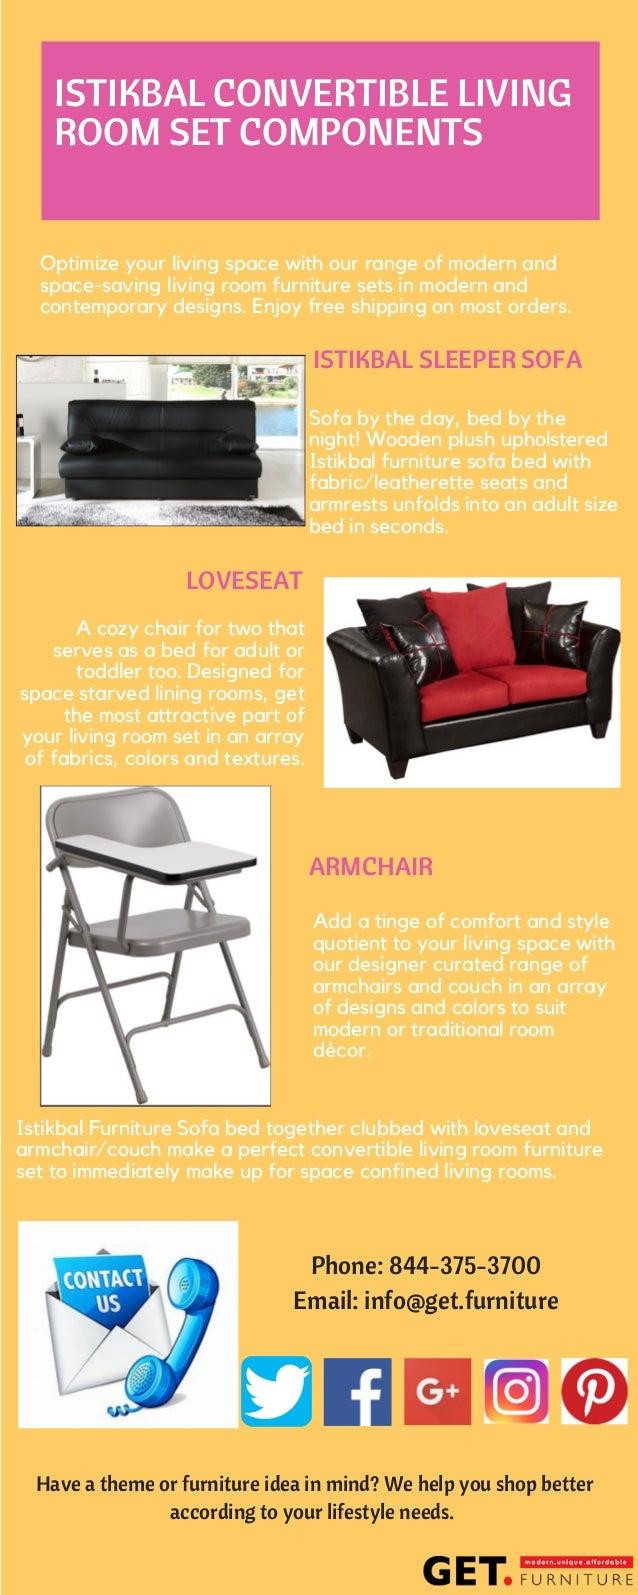 Surprising Istikbal Convertible Living Room Set Components Beatyapartments Chair Design Images Beatyapartmentscom